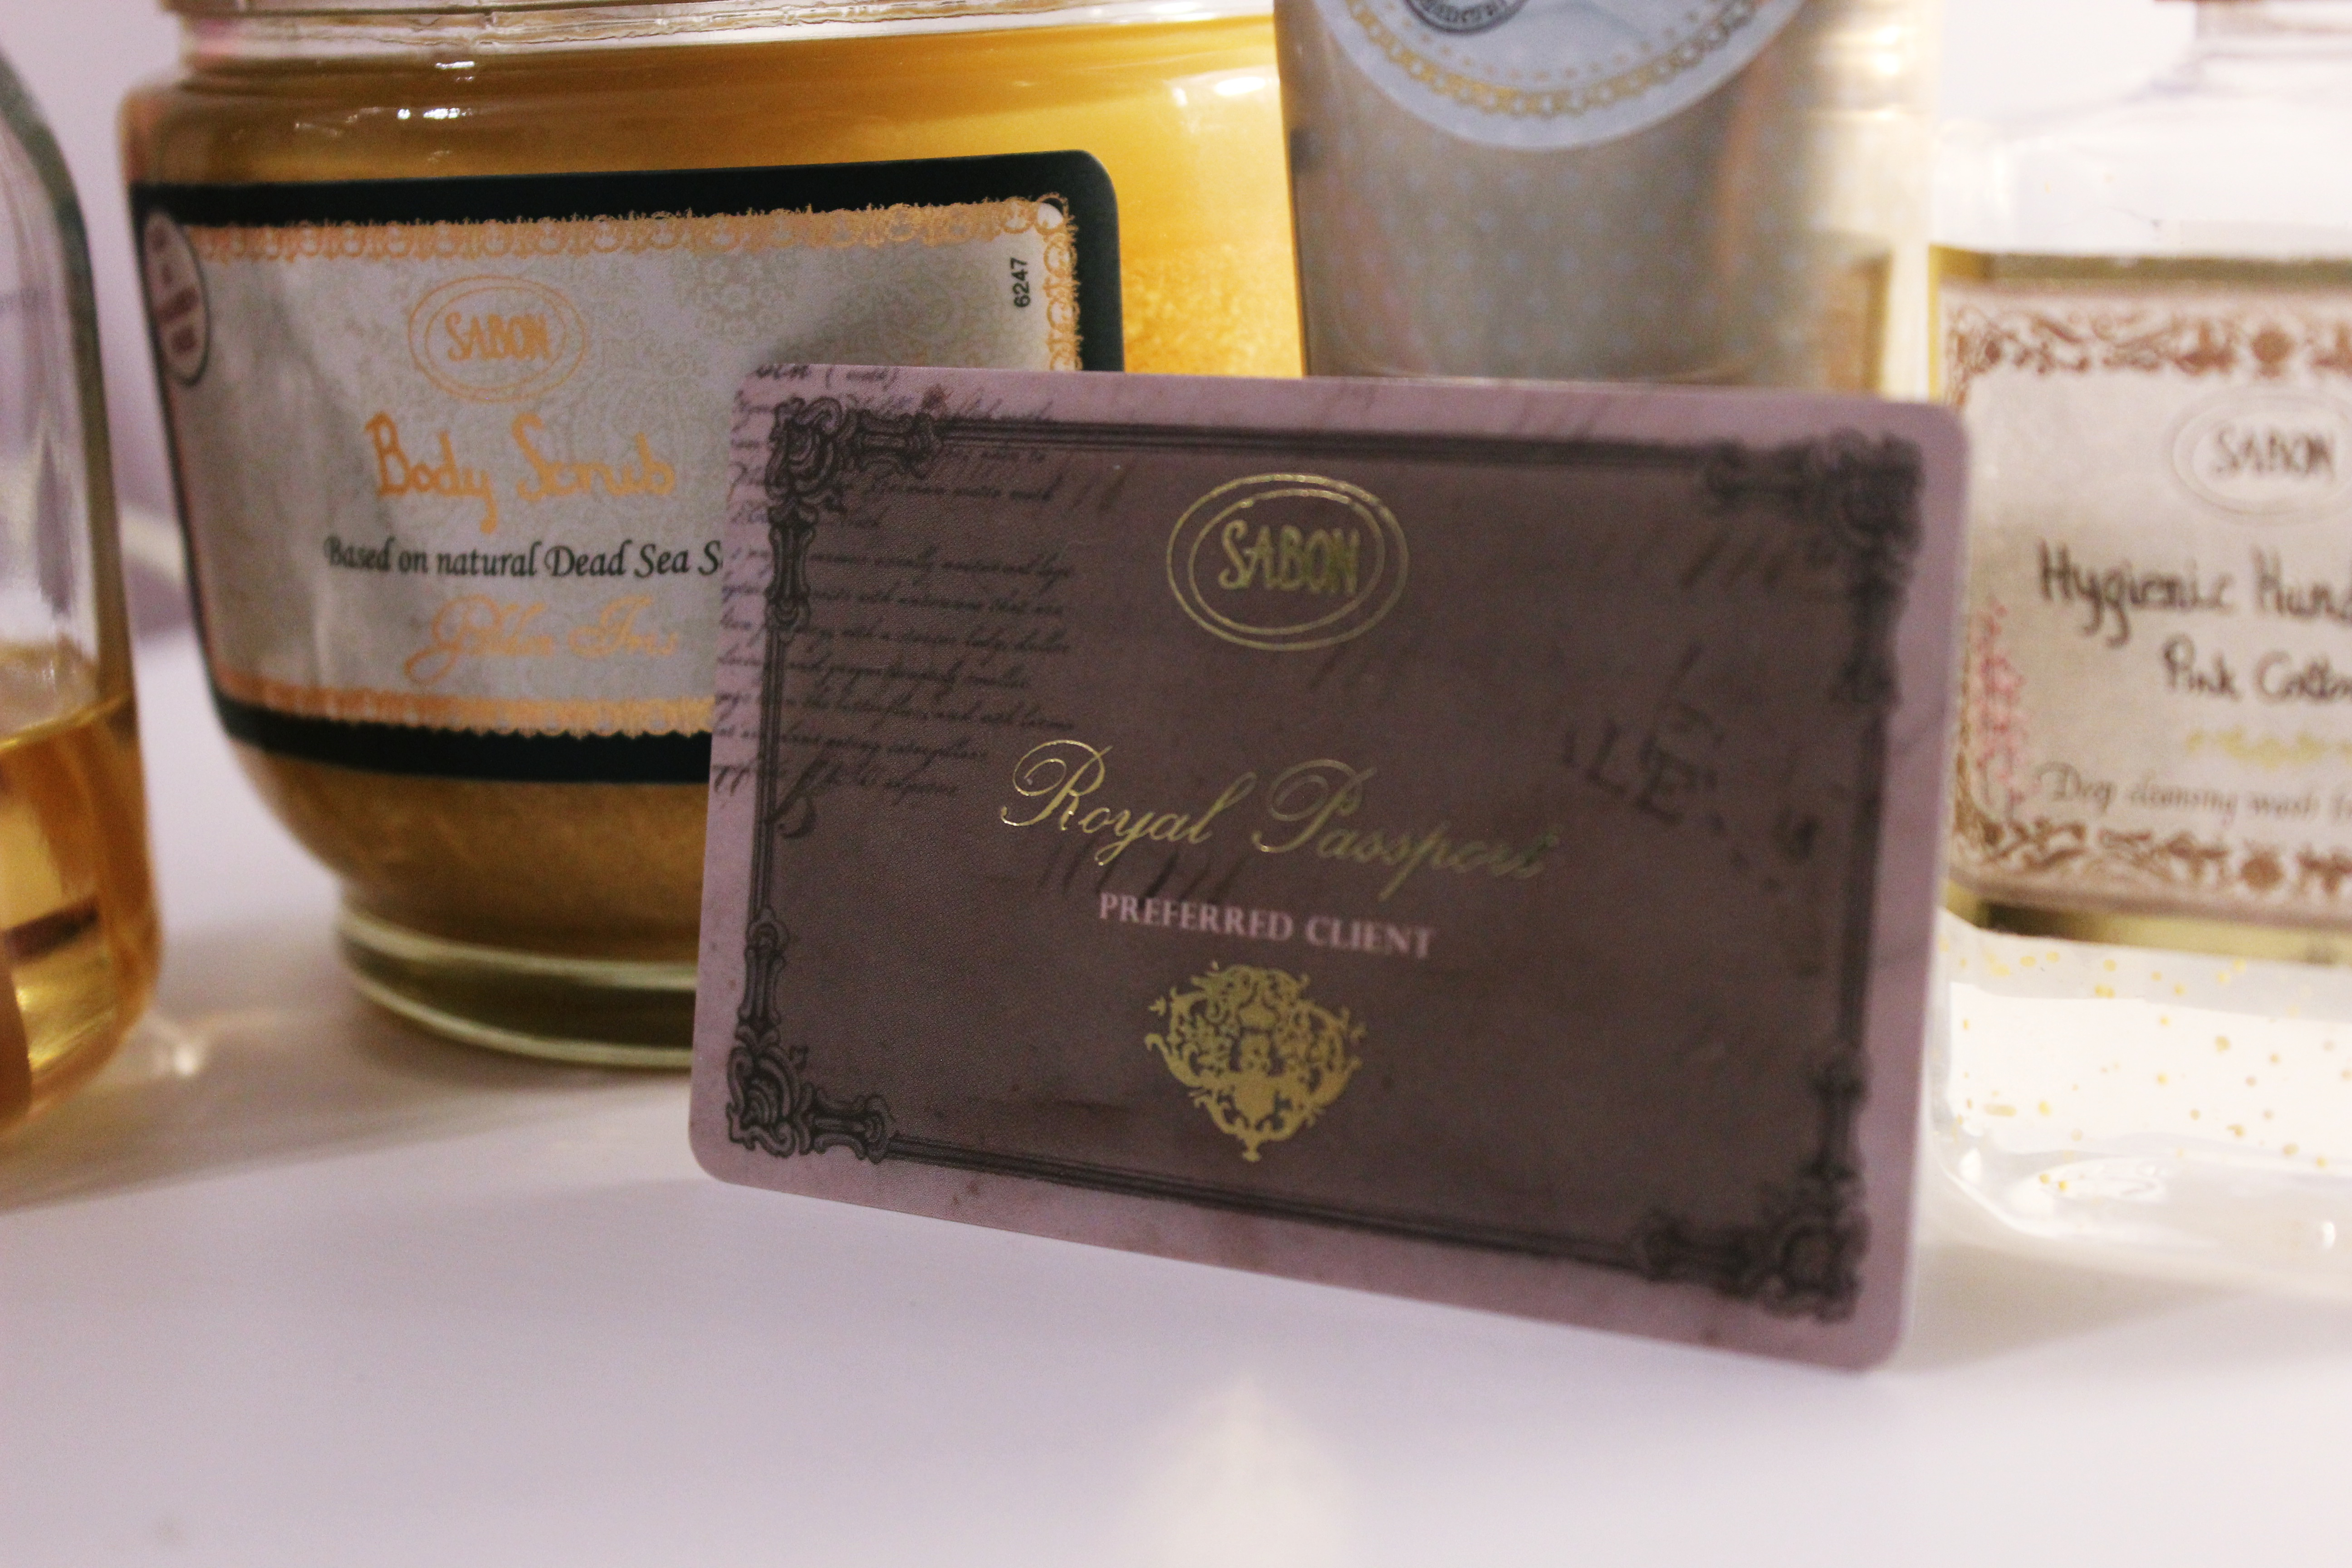 Royal Passport Sabon